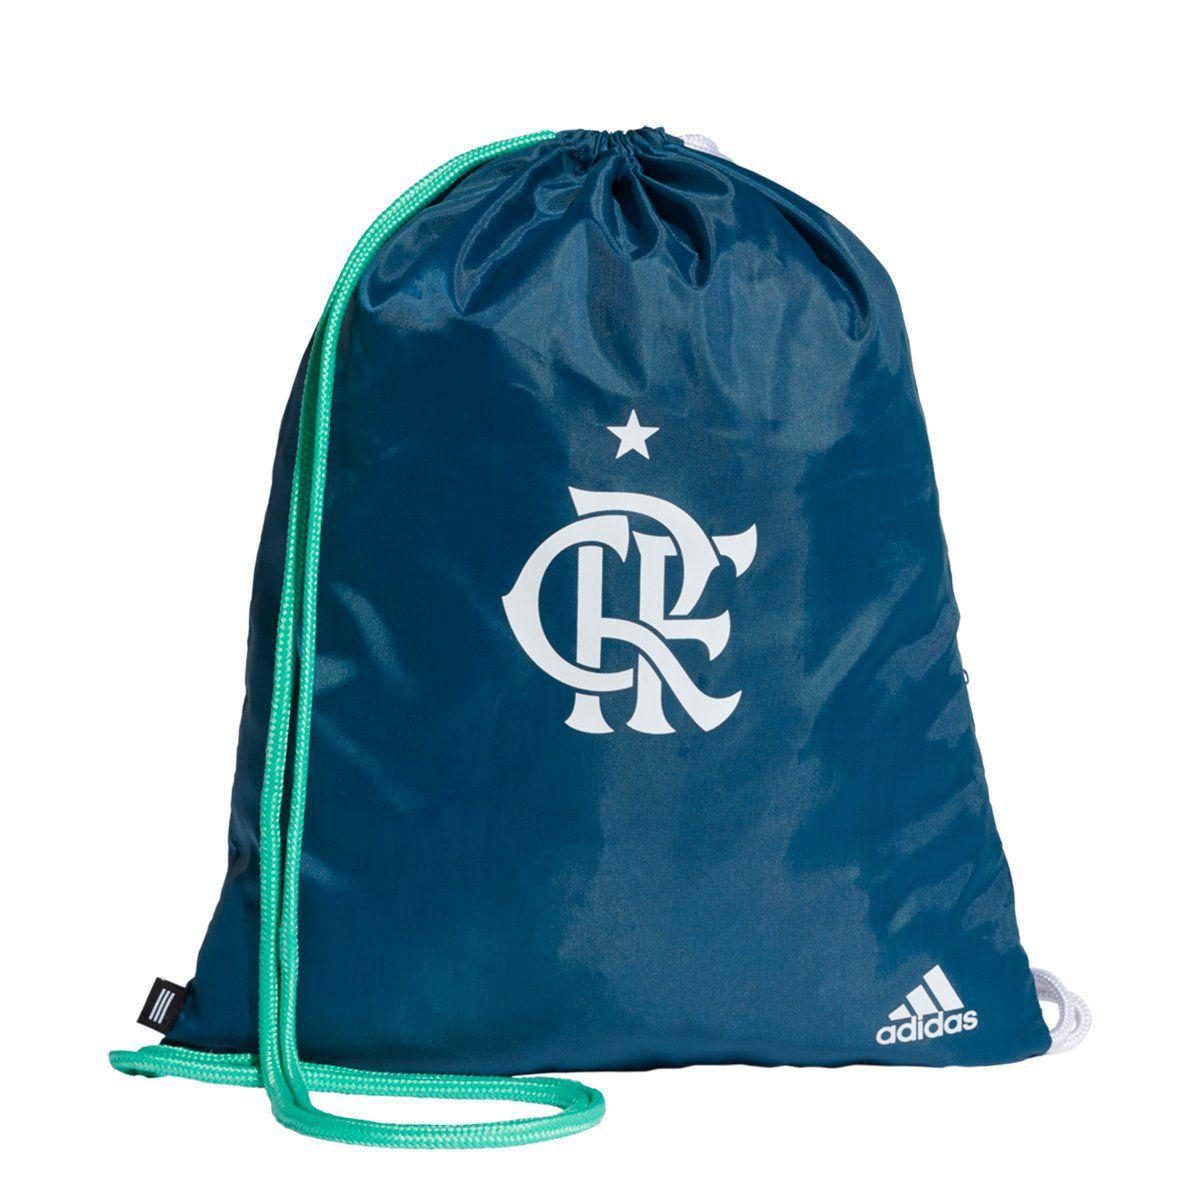 Mochila Sacola Flamengo Adidas Gym Sack